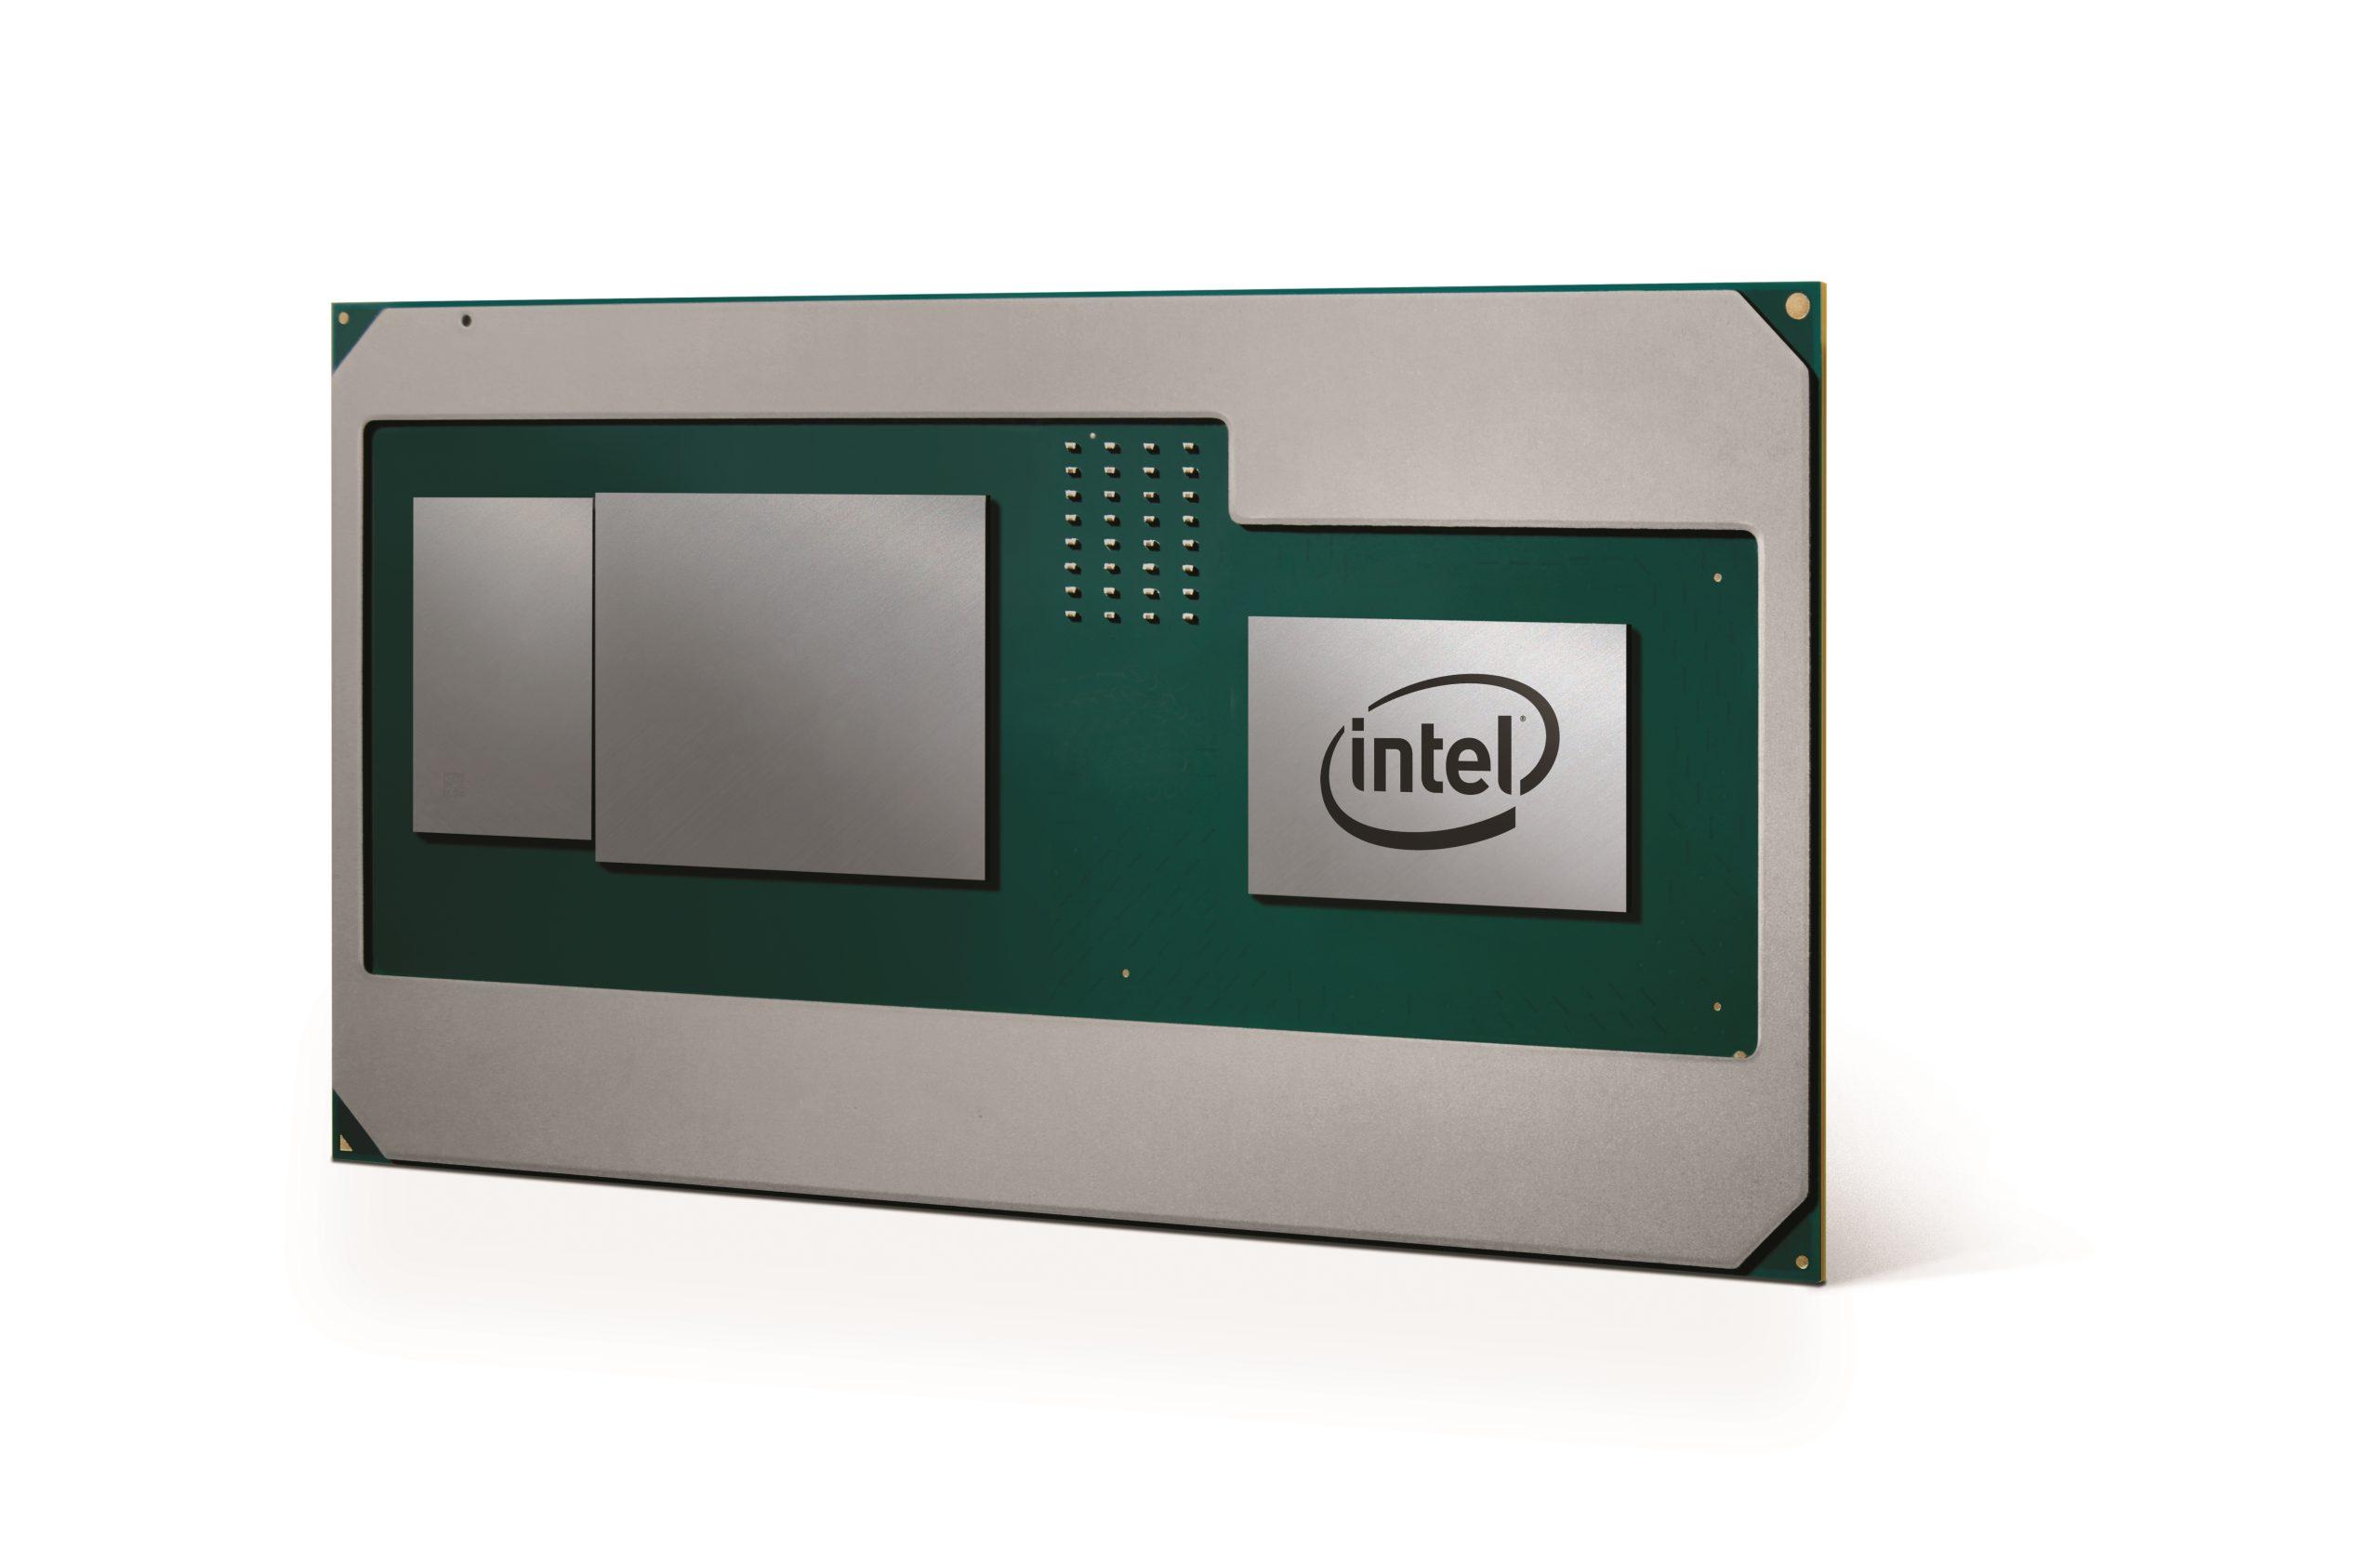 Intel Announces New CPUs Integrating AMD Radeon Graphics